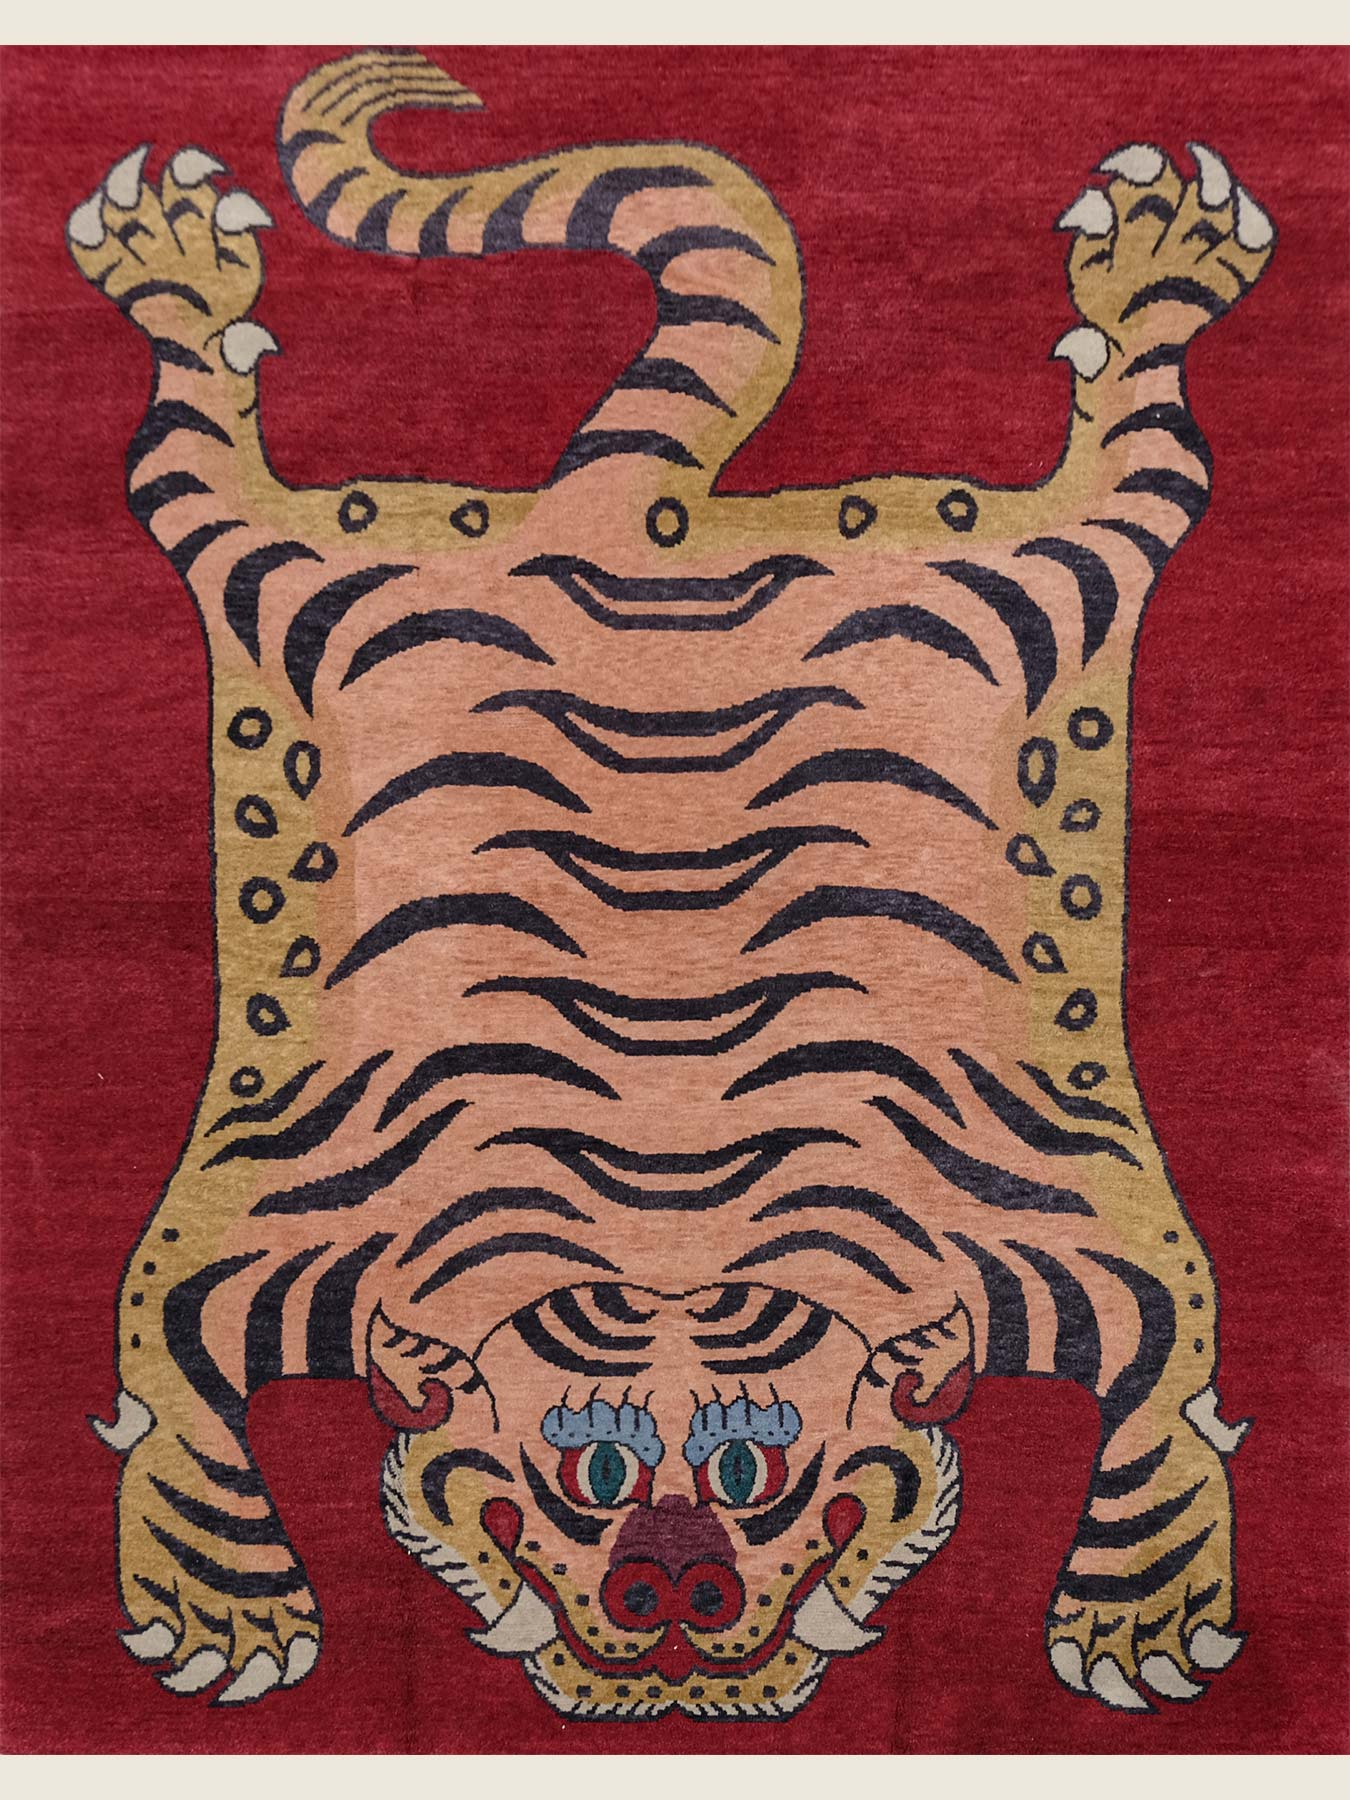 lucky tiger jumping zt-7r